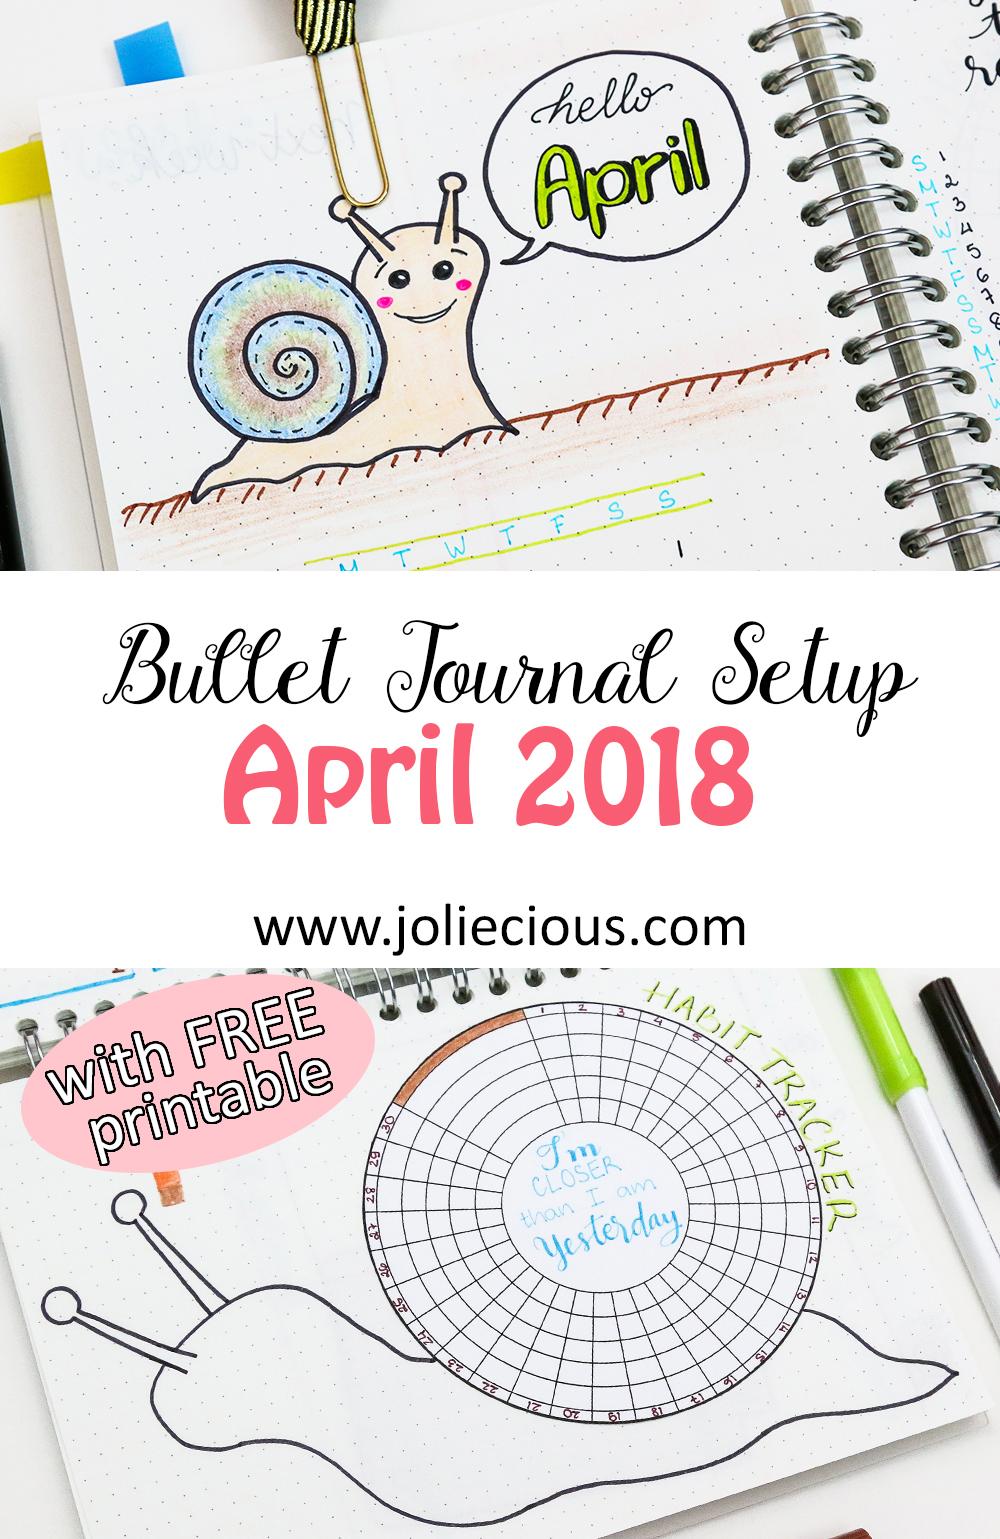 April 2018 Bullet Journal Setup + Free Habit Tracker Printable